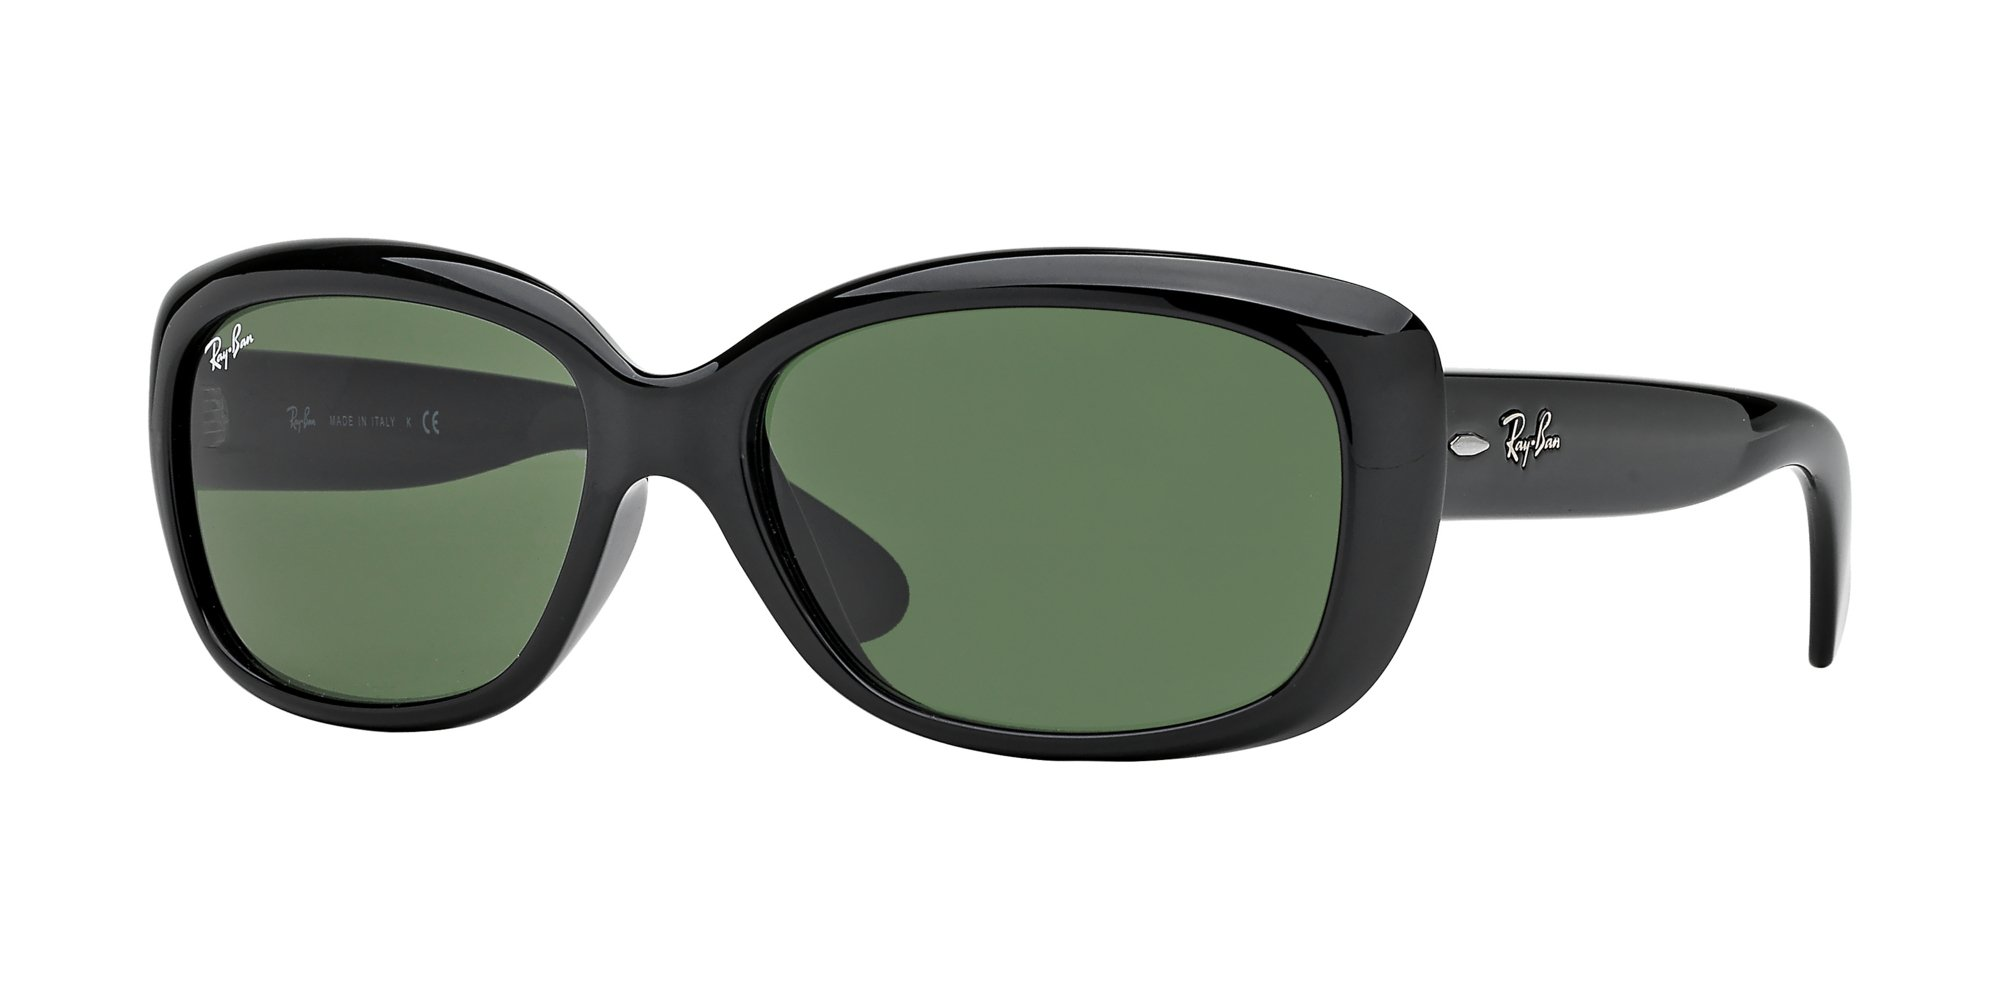 b04ddcda99 Ray-Ban Sonnenbrille Jackie OHH 4101 601 58 Black Green Polarized